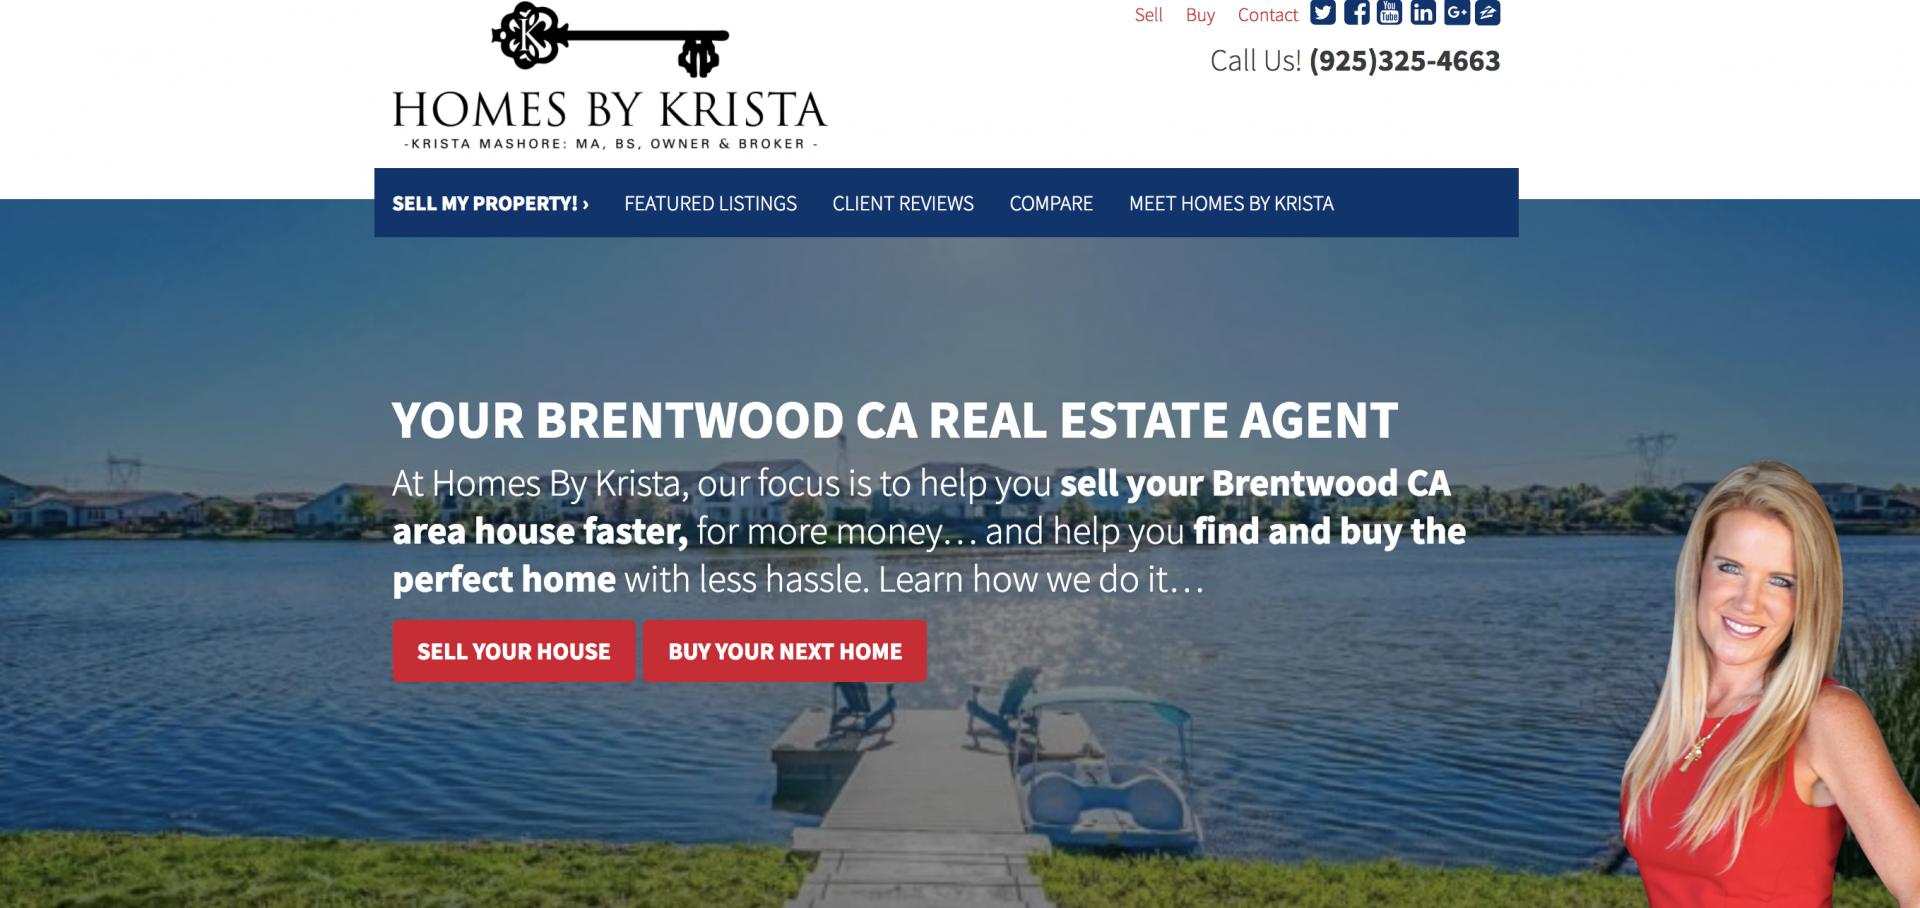 Krista Mashore AgentCarrot Website